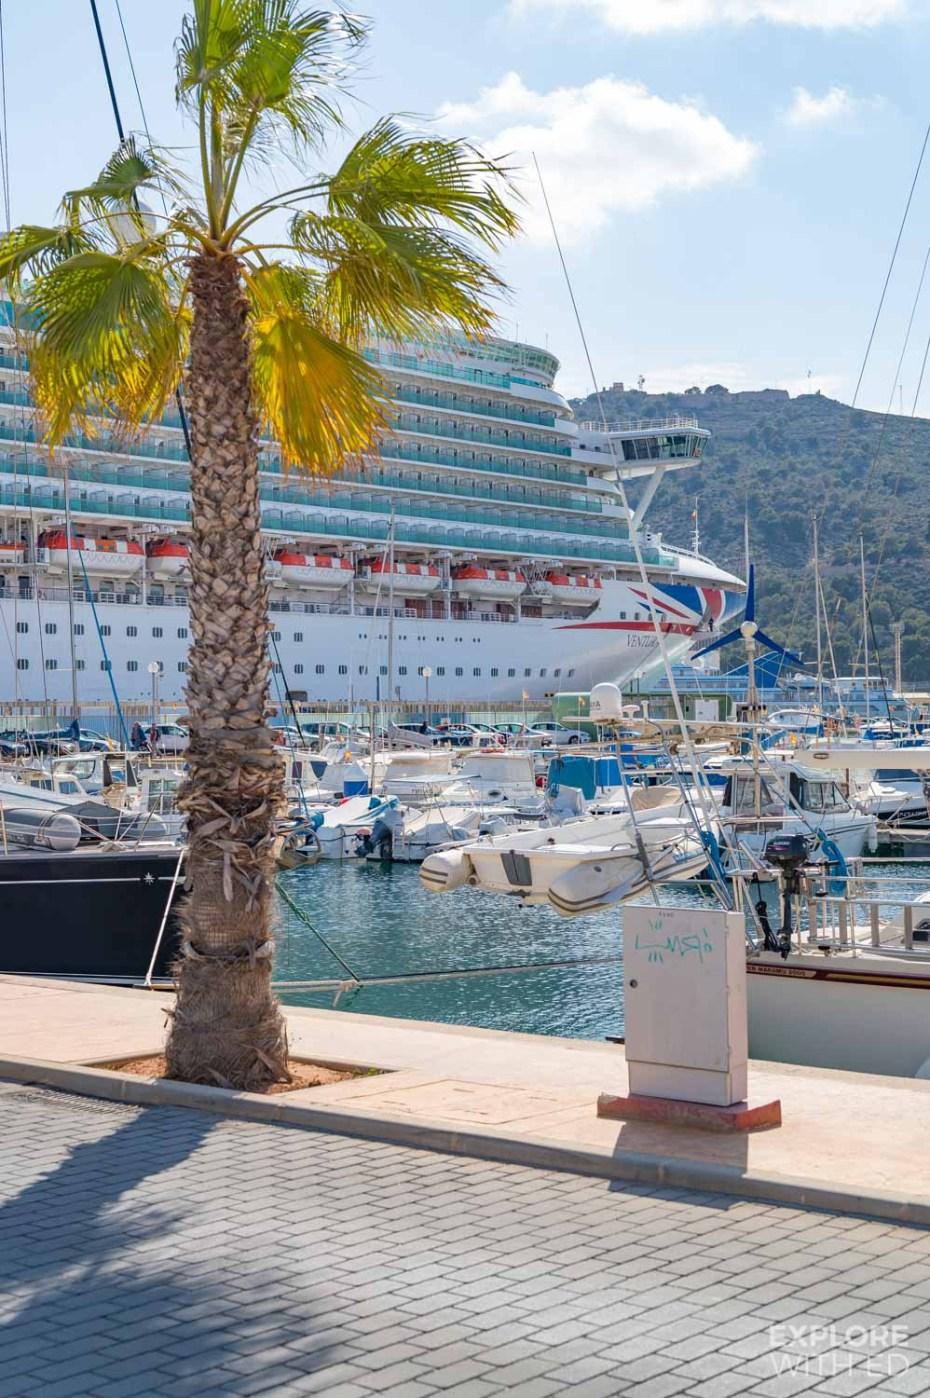 P&O Cruises Ventura docked in Cartagena, Spain during an Iberian Cruise